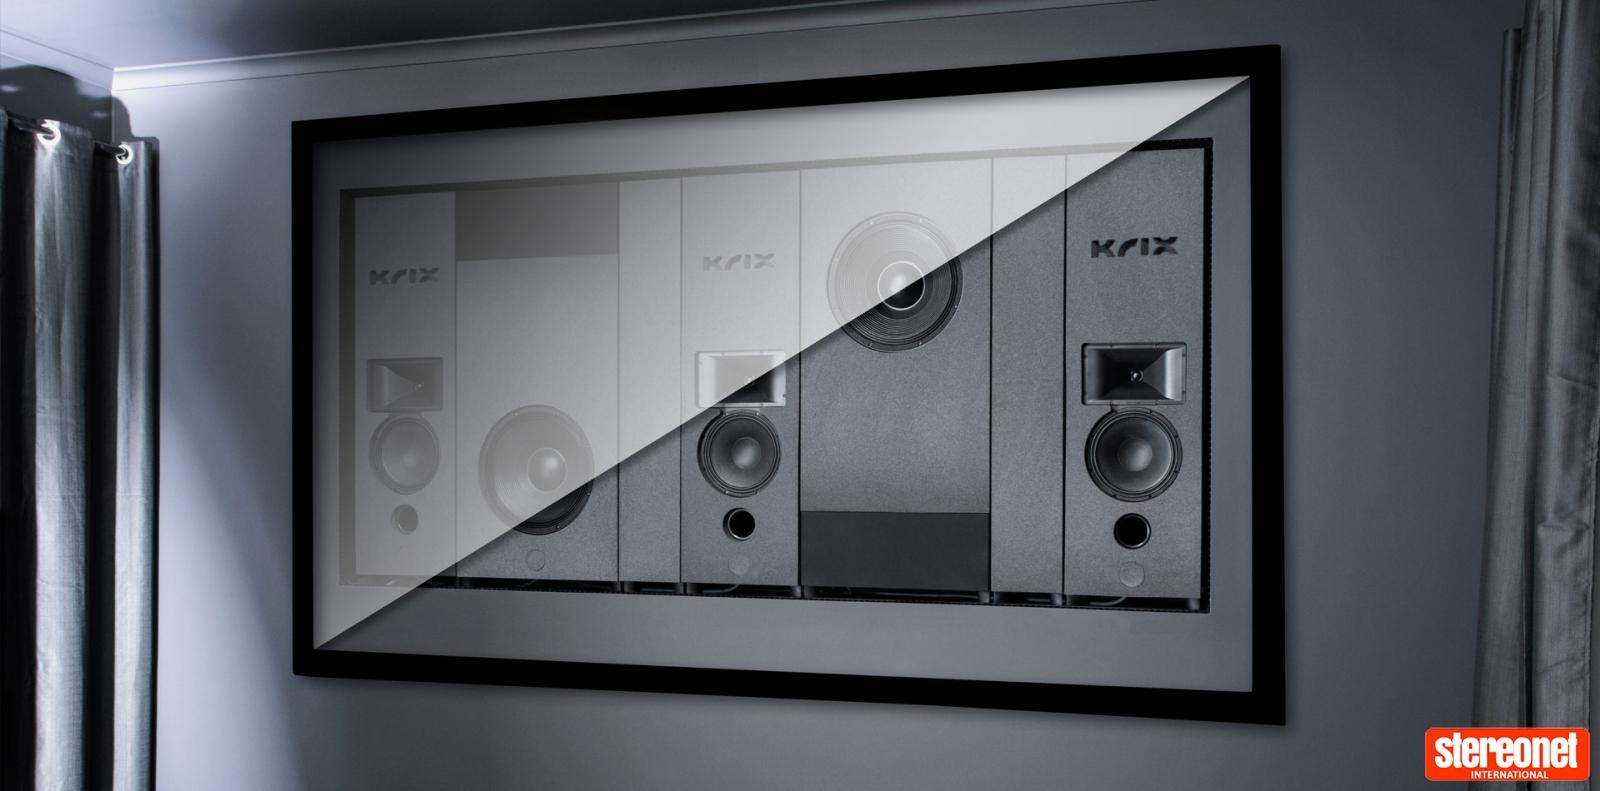 Krix MX20 Cinema Loudspeakers